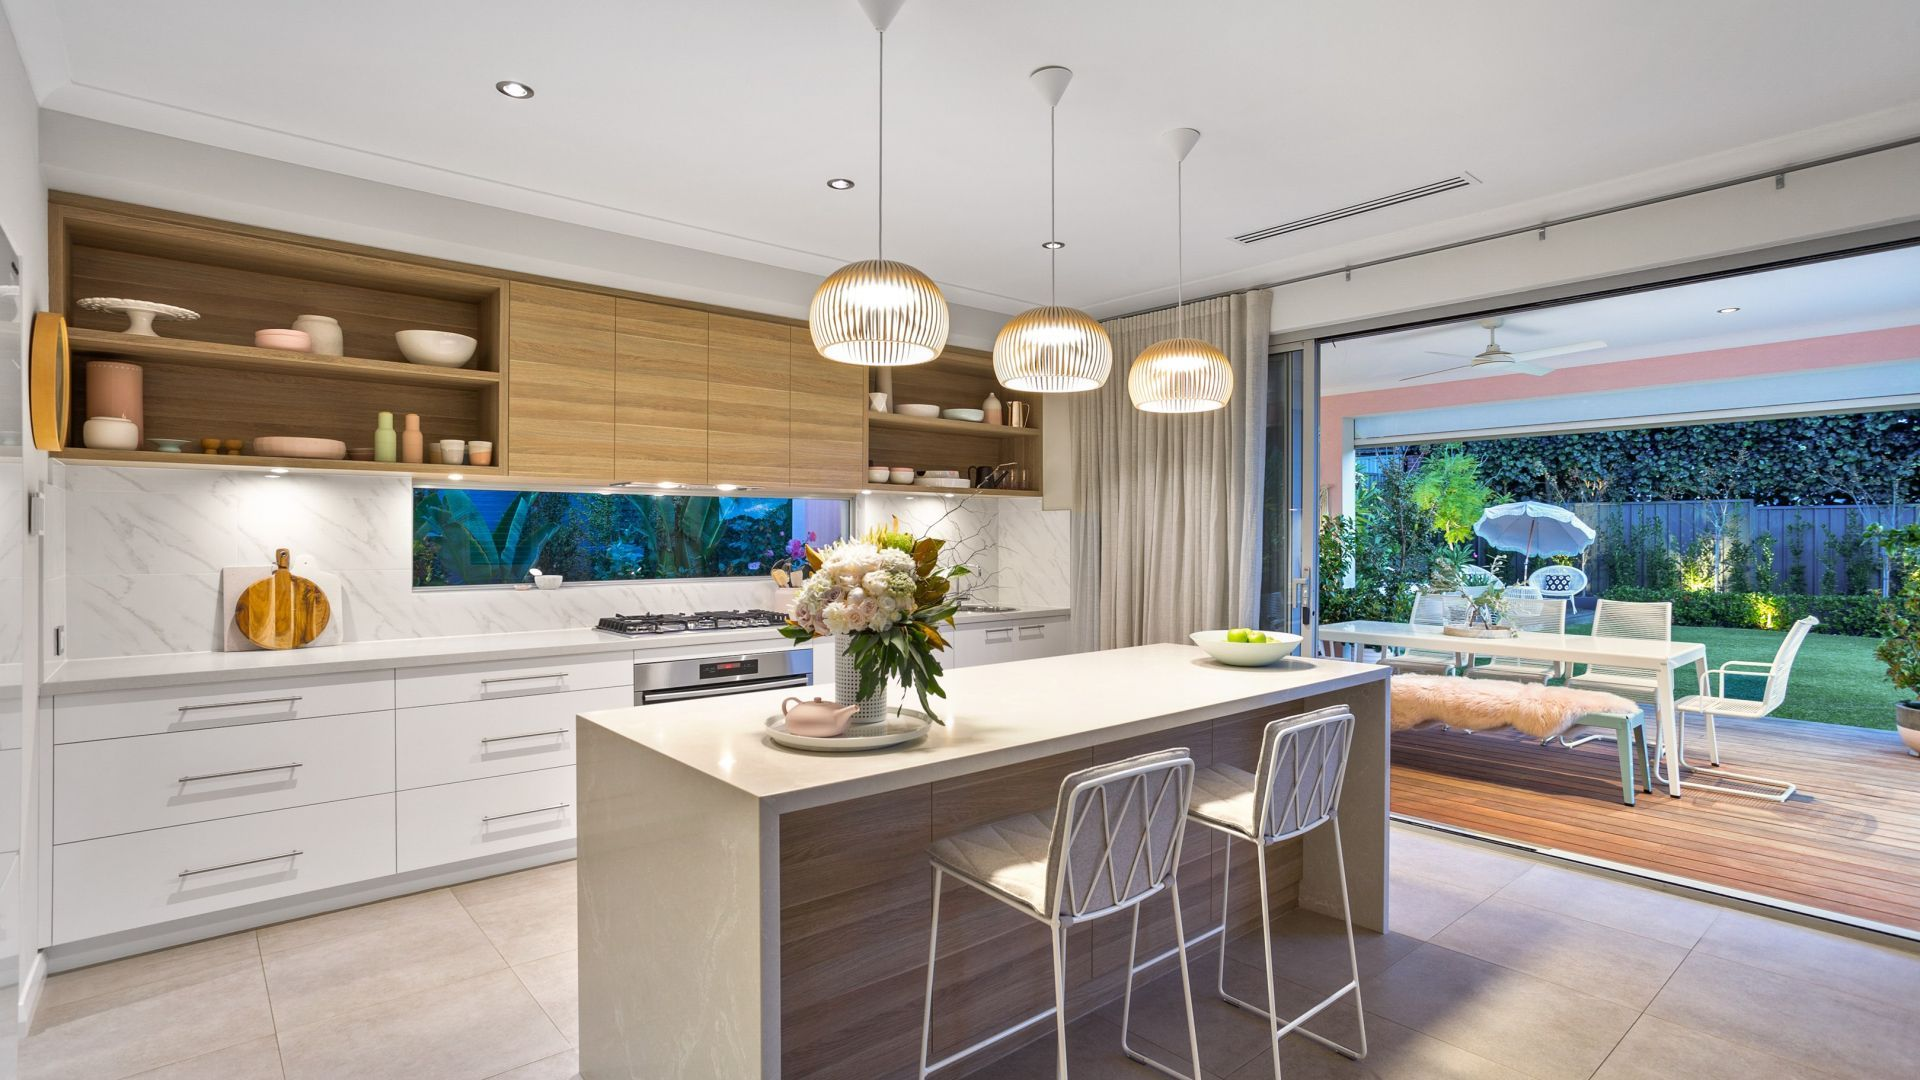 41 Hampden Street, South Perth WA 6151, Image 7 Kitchen